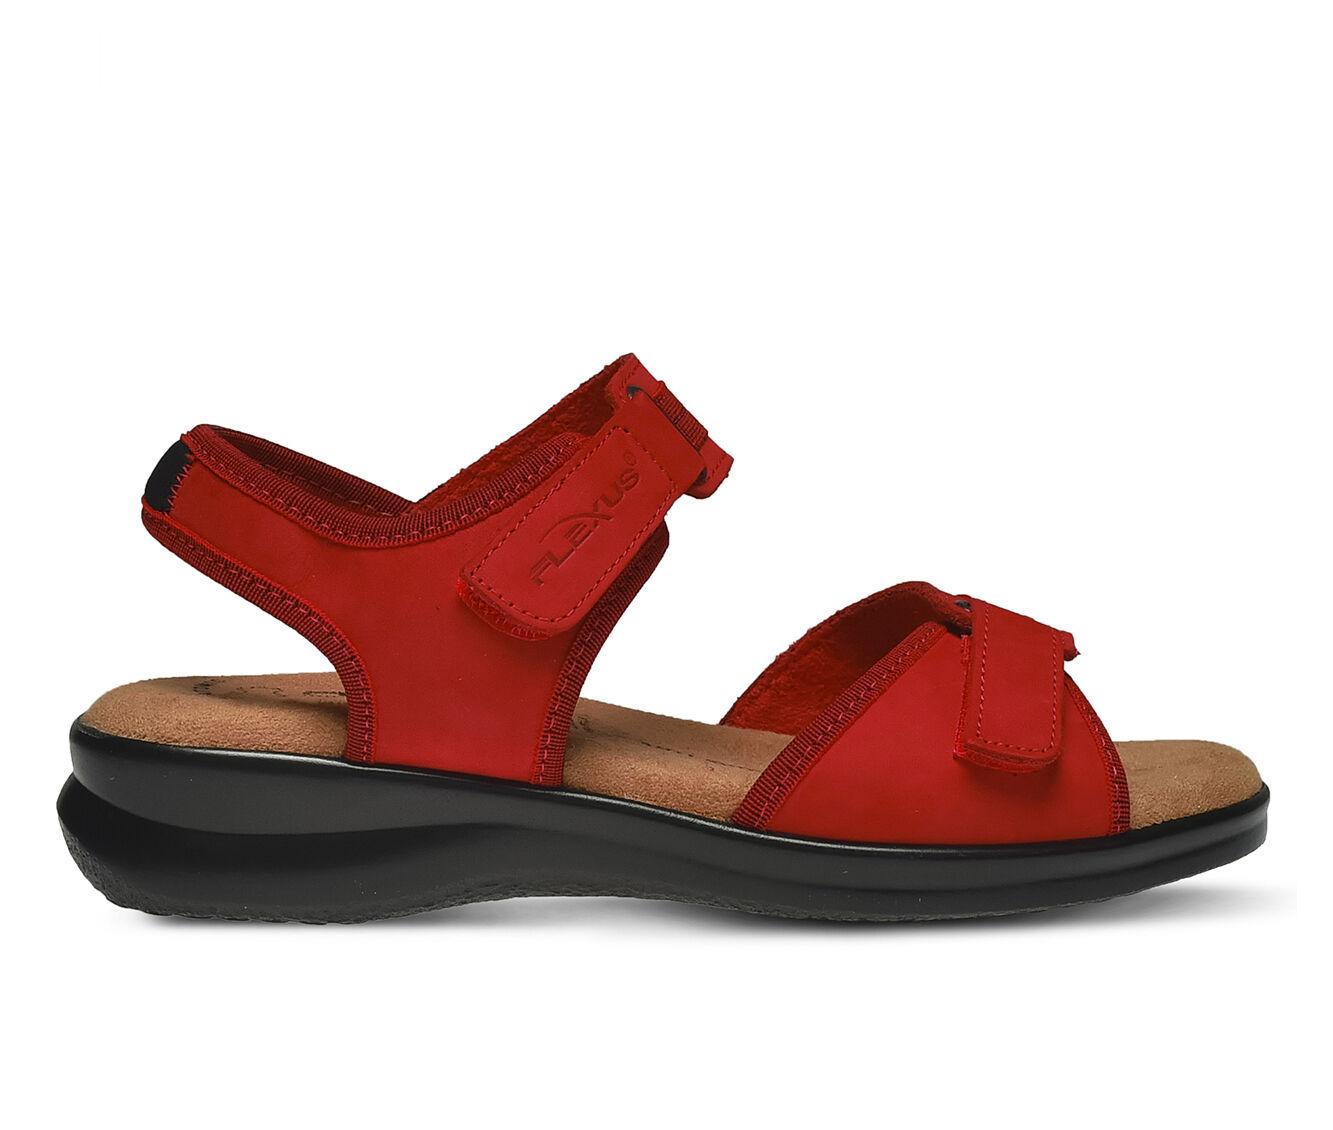 all styles Women's FLEXUS Danila Sandals Red